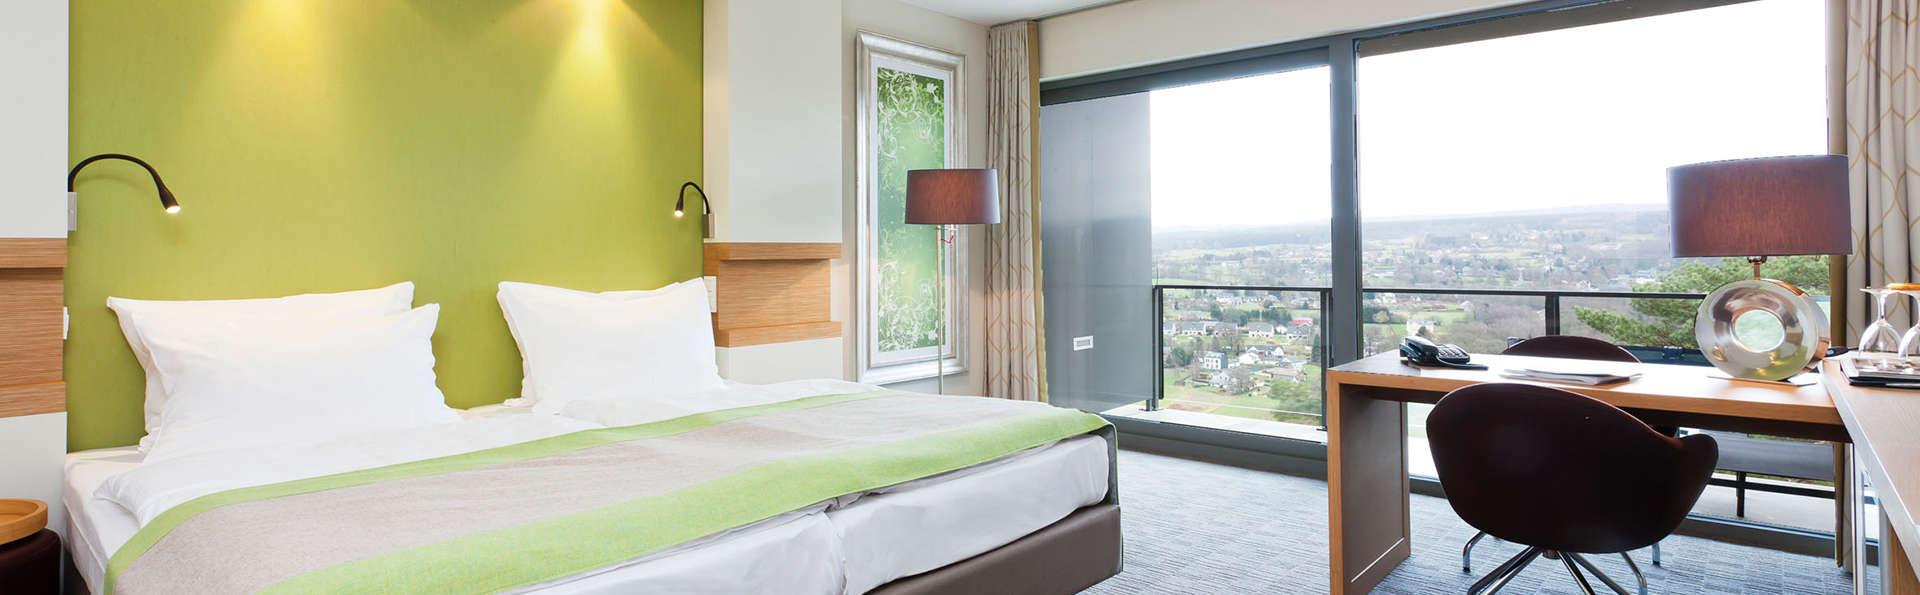 Silva Hotel Spa-Balmoral - Edit_room15.jpg